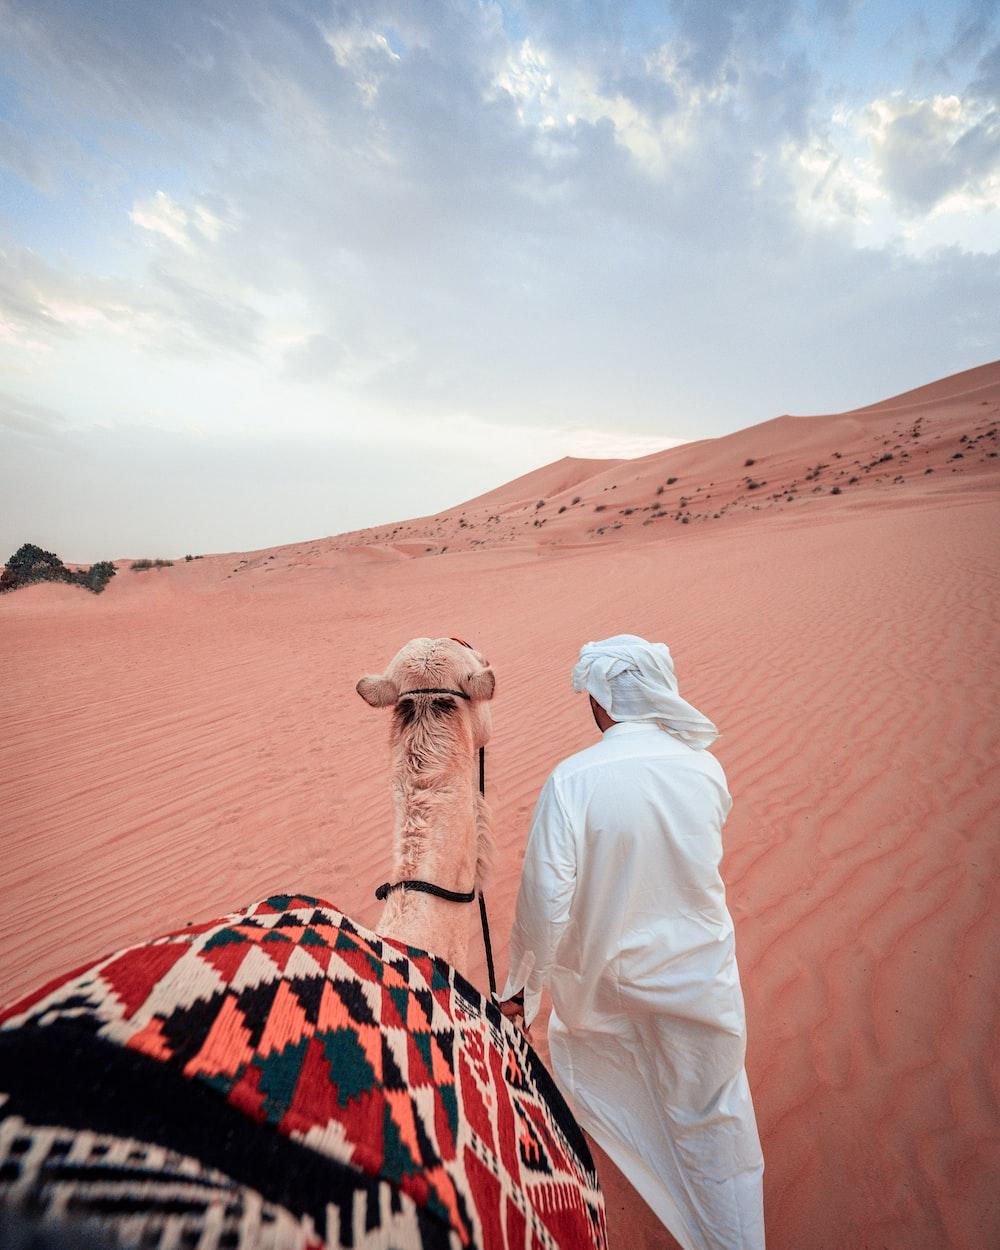 man pulling camel